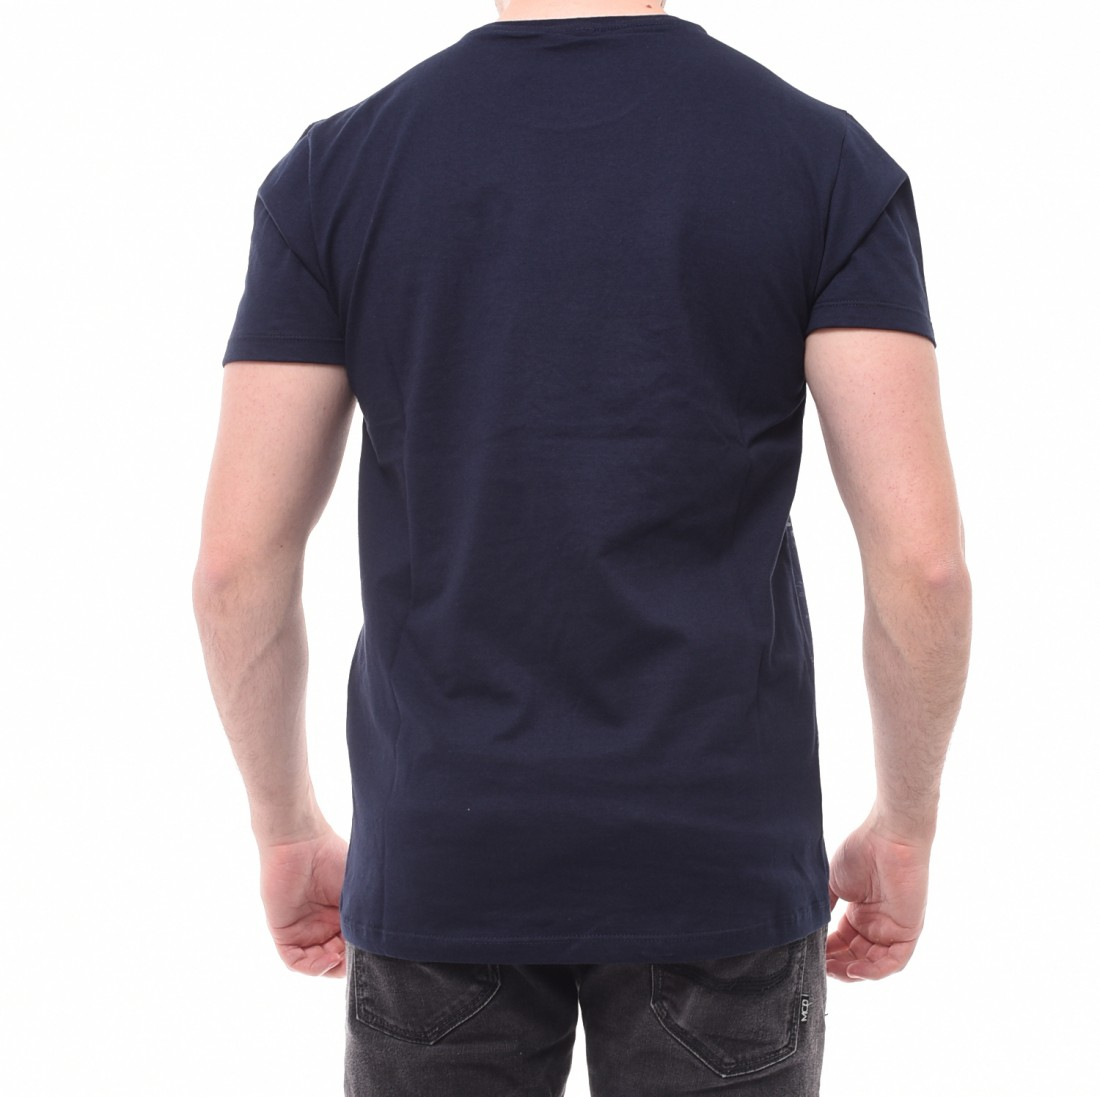 Camiseta Oakley Estampada com Bolso Azul Marinho · Camiseta Oakley Estampada  com Bolso Azul Marinho ad0a77ec7f8d6